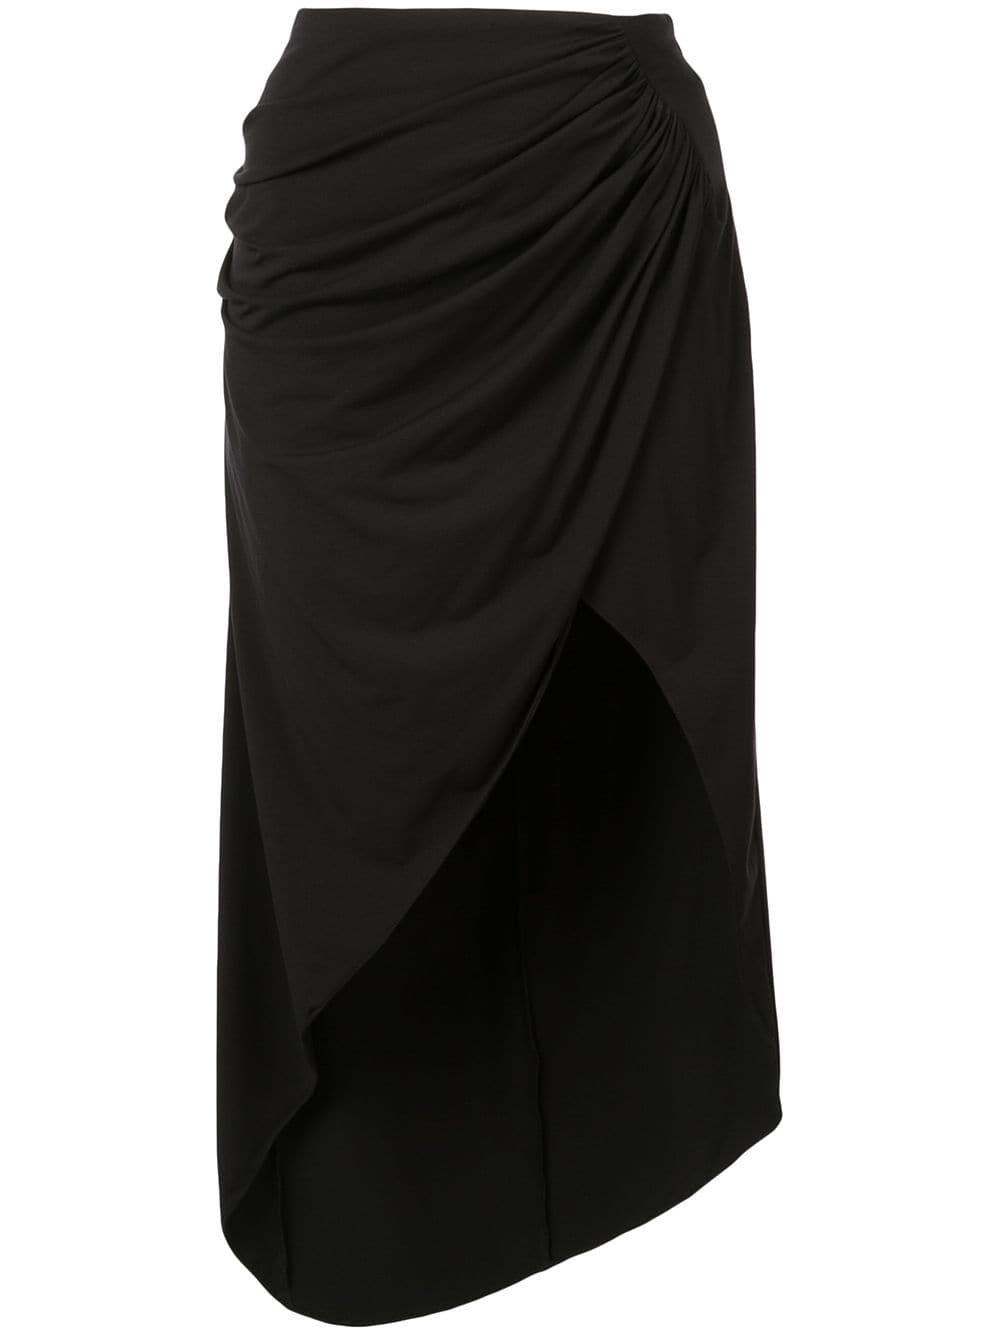 Fleur Du Mal Draped Midi Skirt Farfetch Black Midi Skirt Midi Skirt Skirts